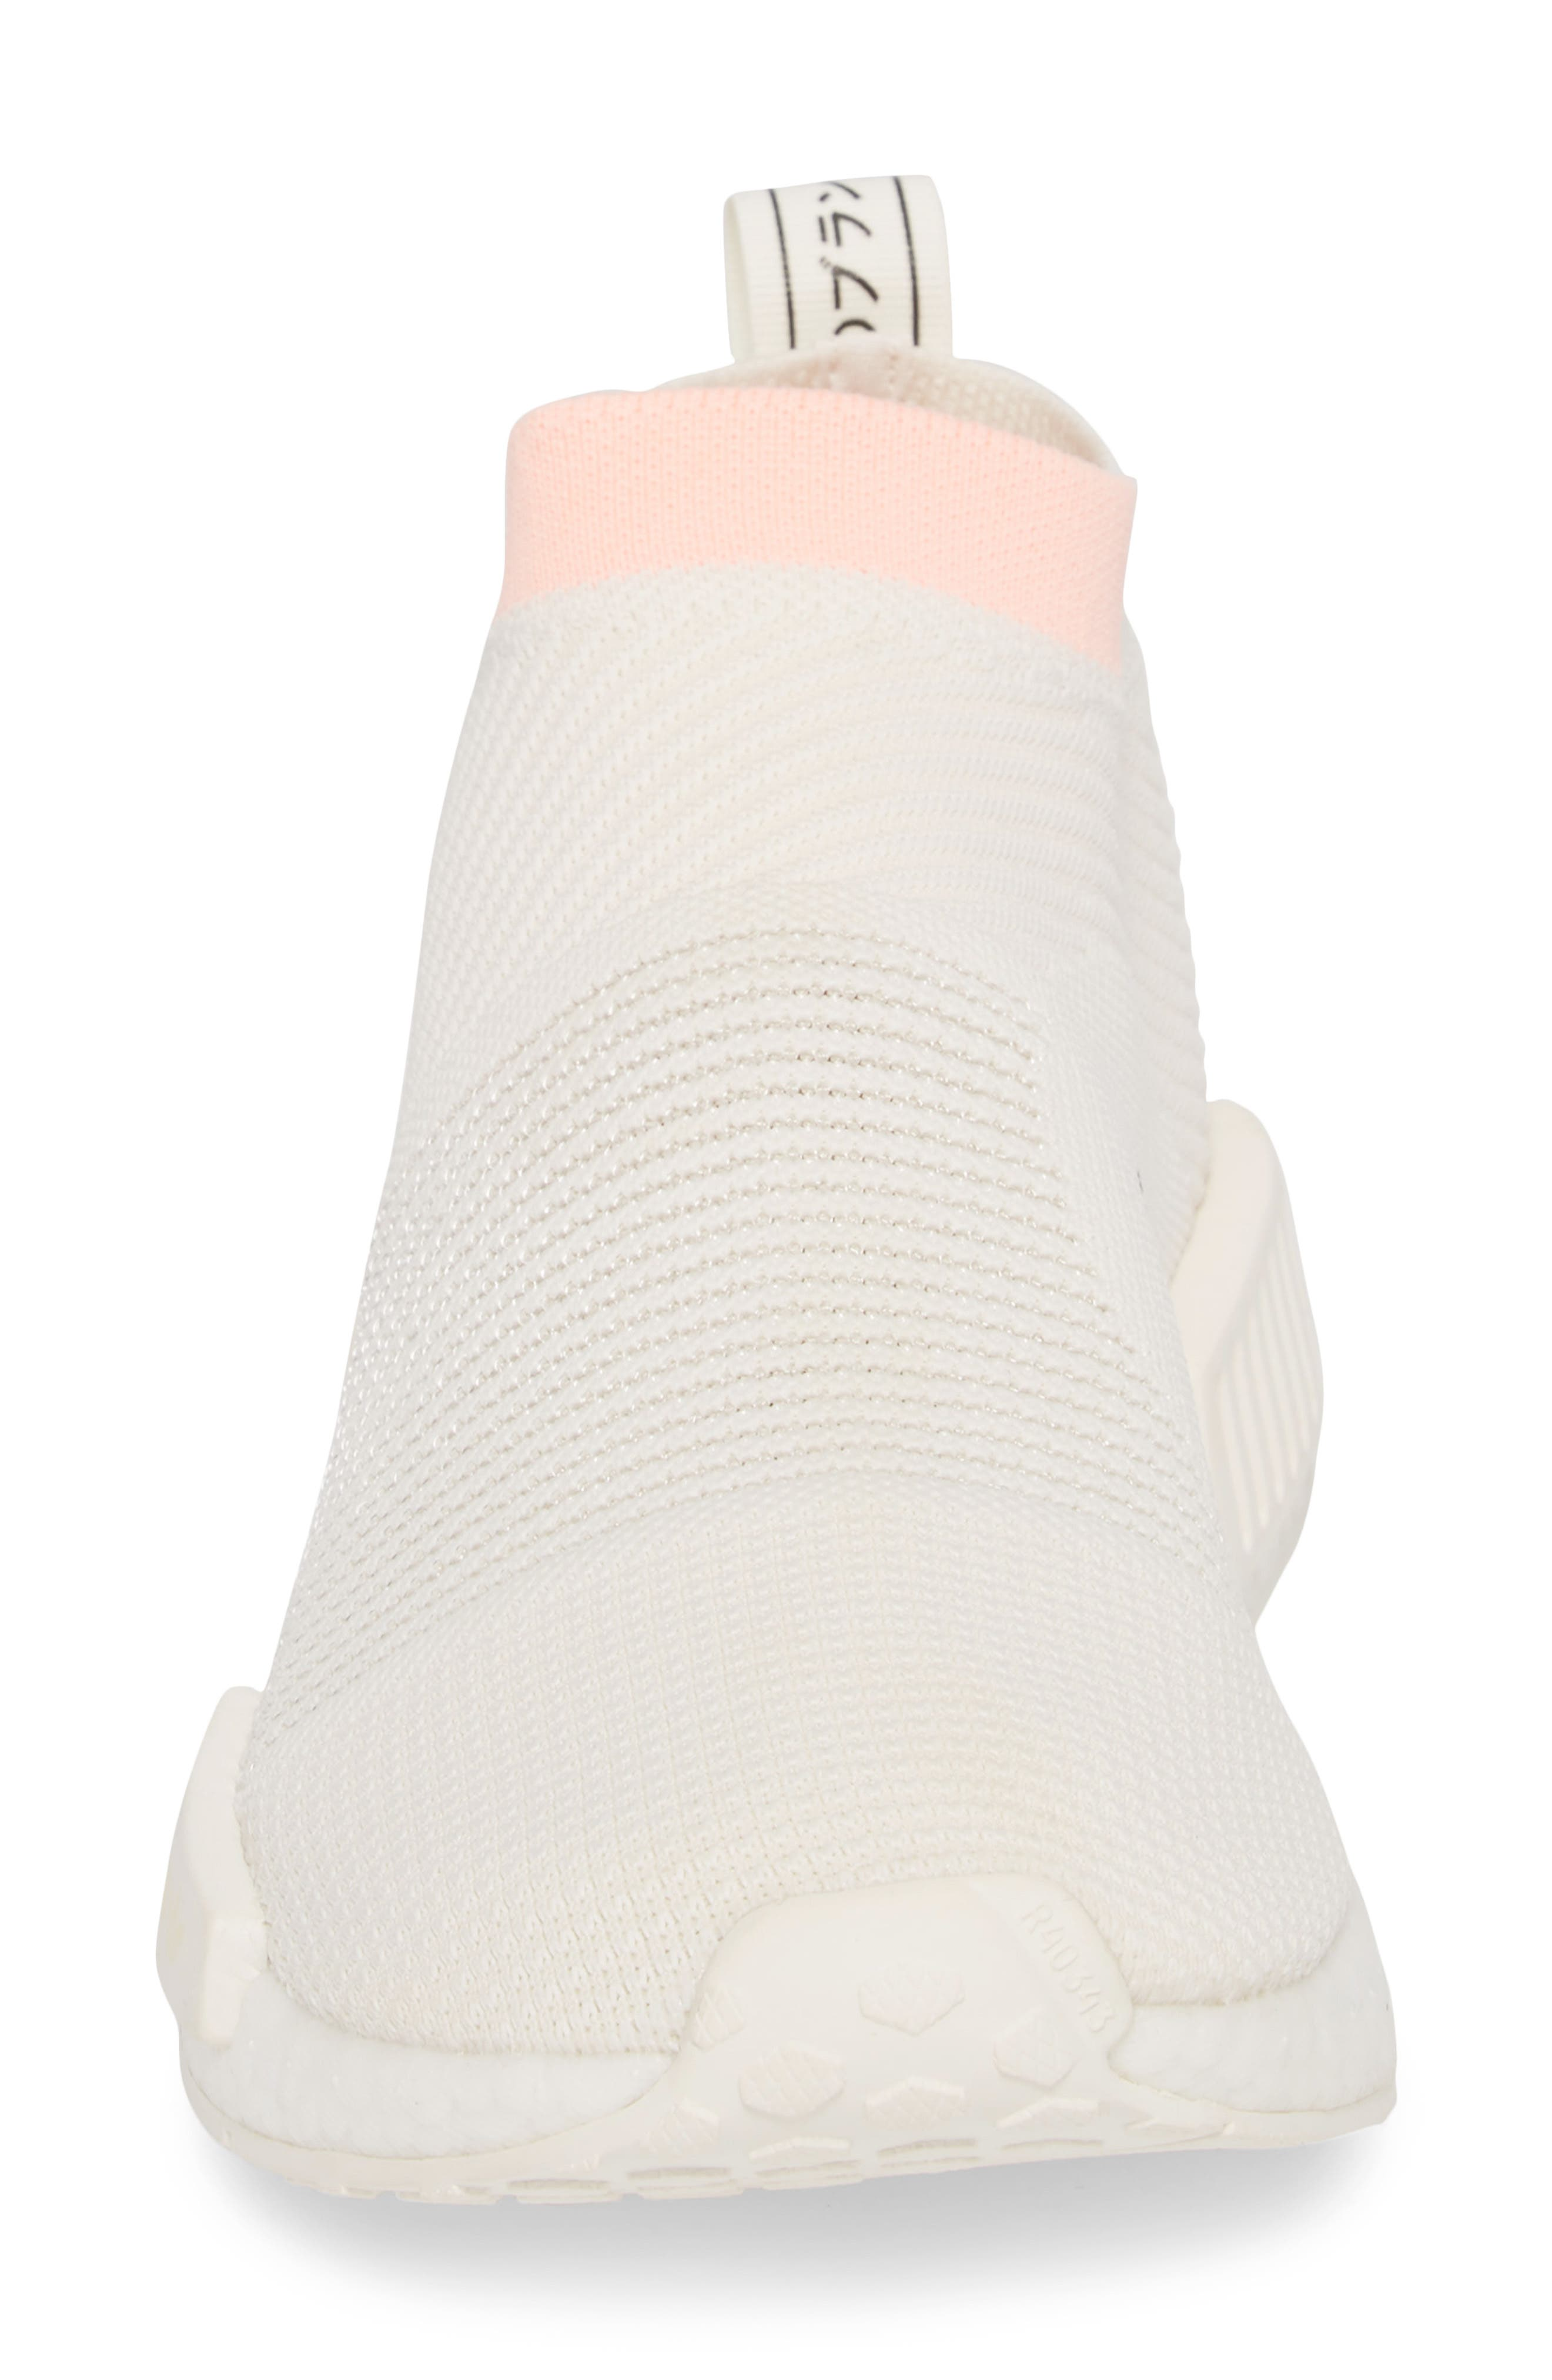 NMD_CS1 Primeknit Sneaker,                             Alternate thumbnail 4, color,                             CLOUD WHITE/ CLEAR ORANGE